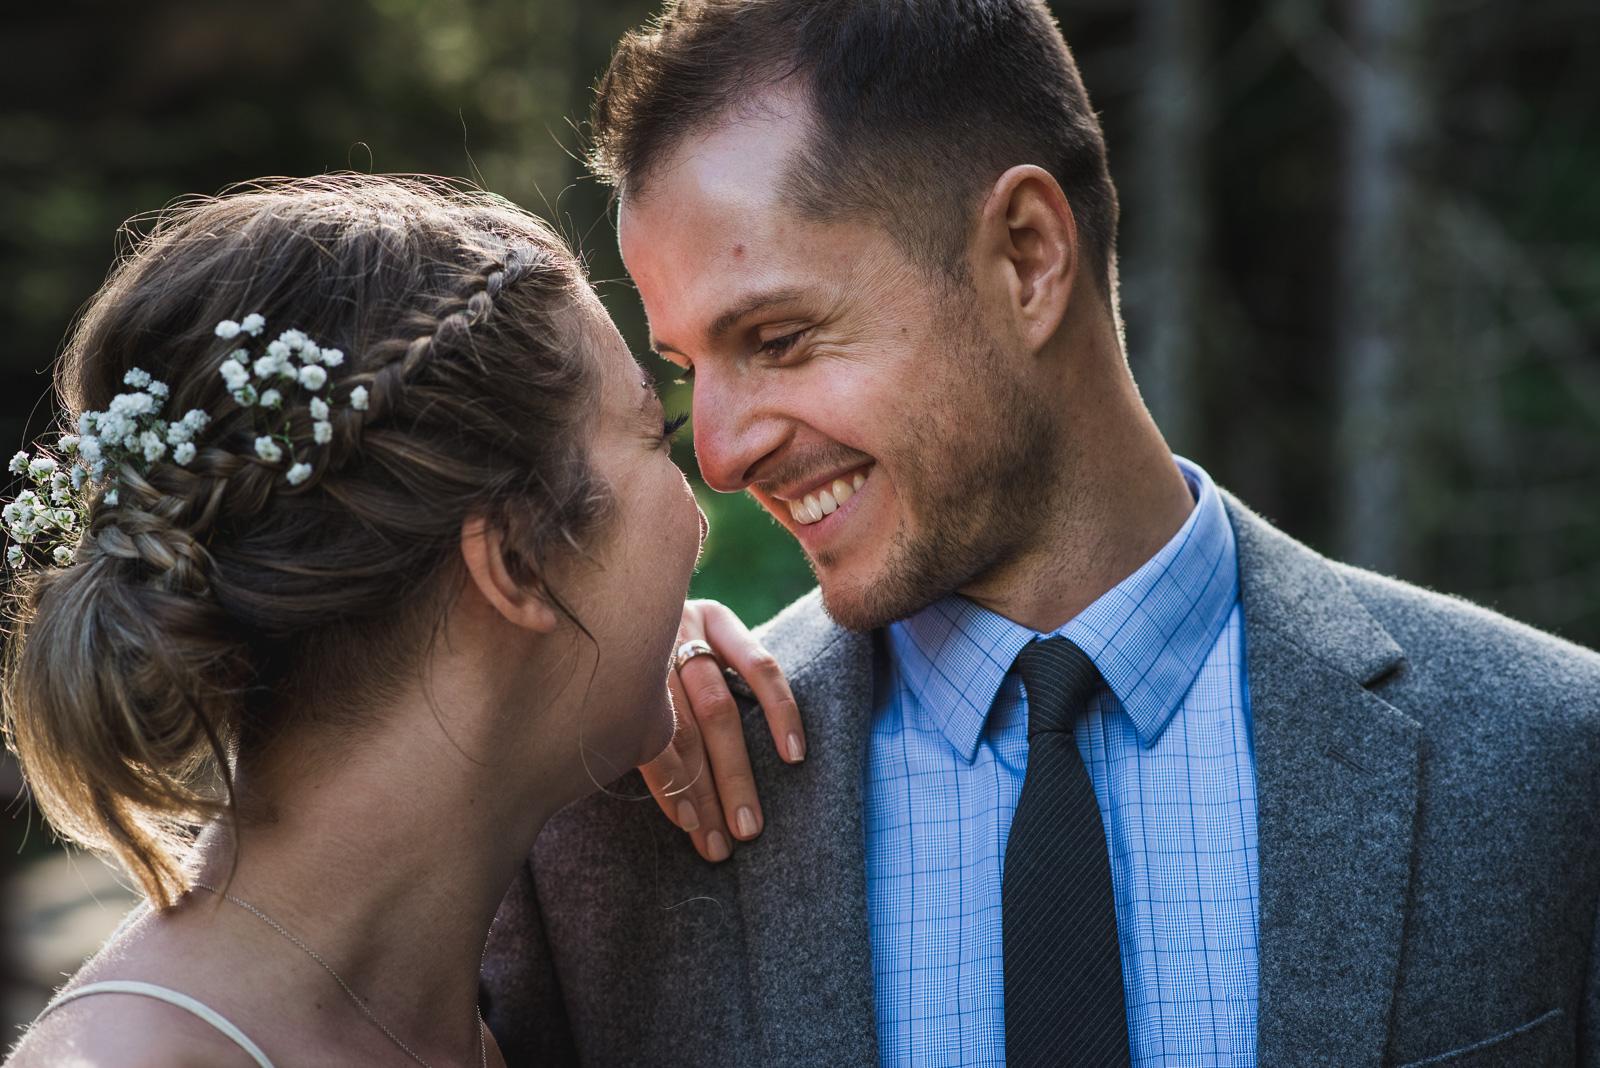 vancouver-island-wedding-photographers-cliff-gilker-park-smugglers-cove-elopement-28.jpg